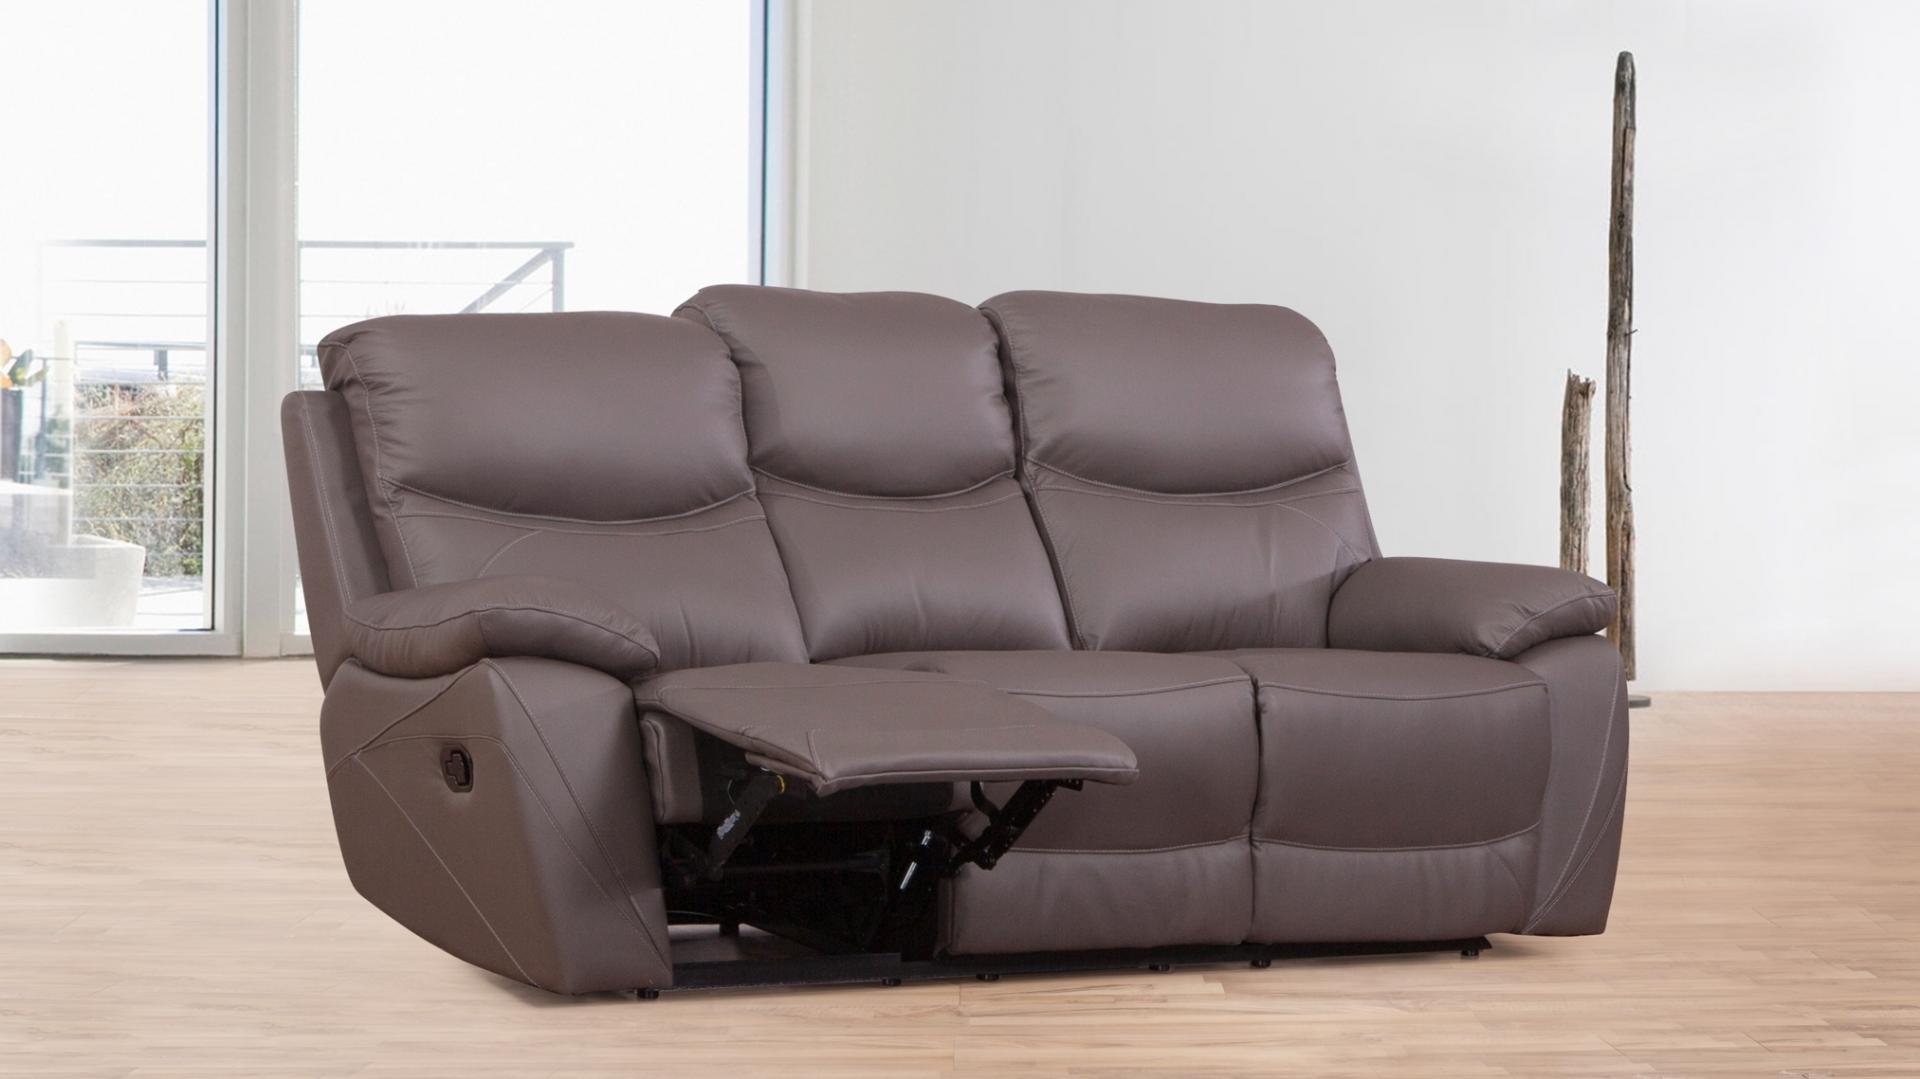 chelsea leather sofa moroni recliner three seater lounge life